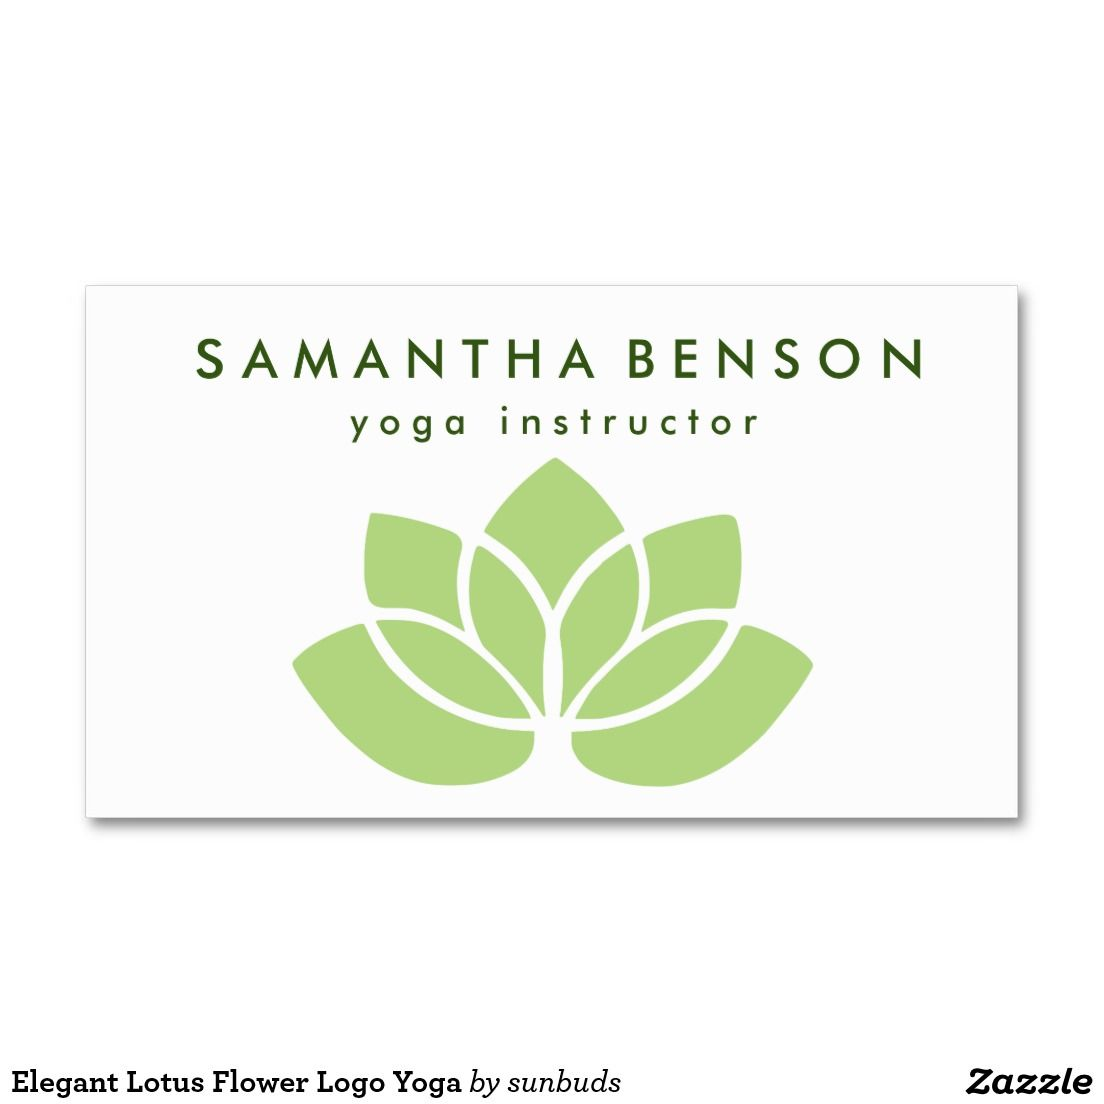 Elegant Lotus Flower Logo Yoga Business Card | Flower logo, Business ...